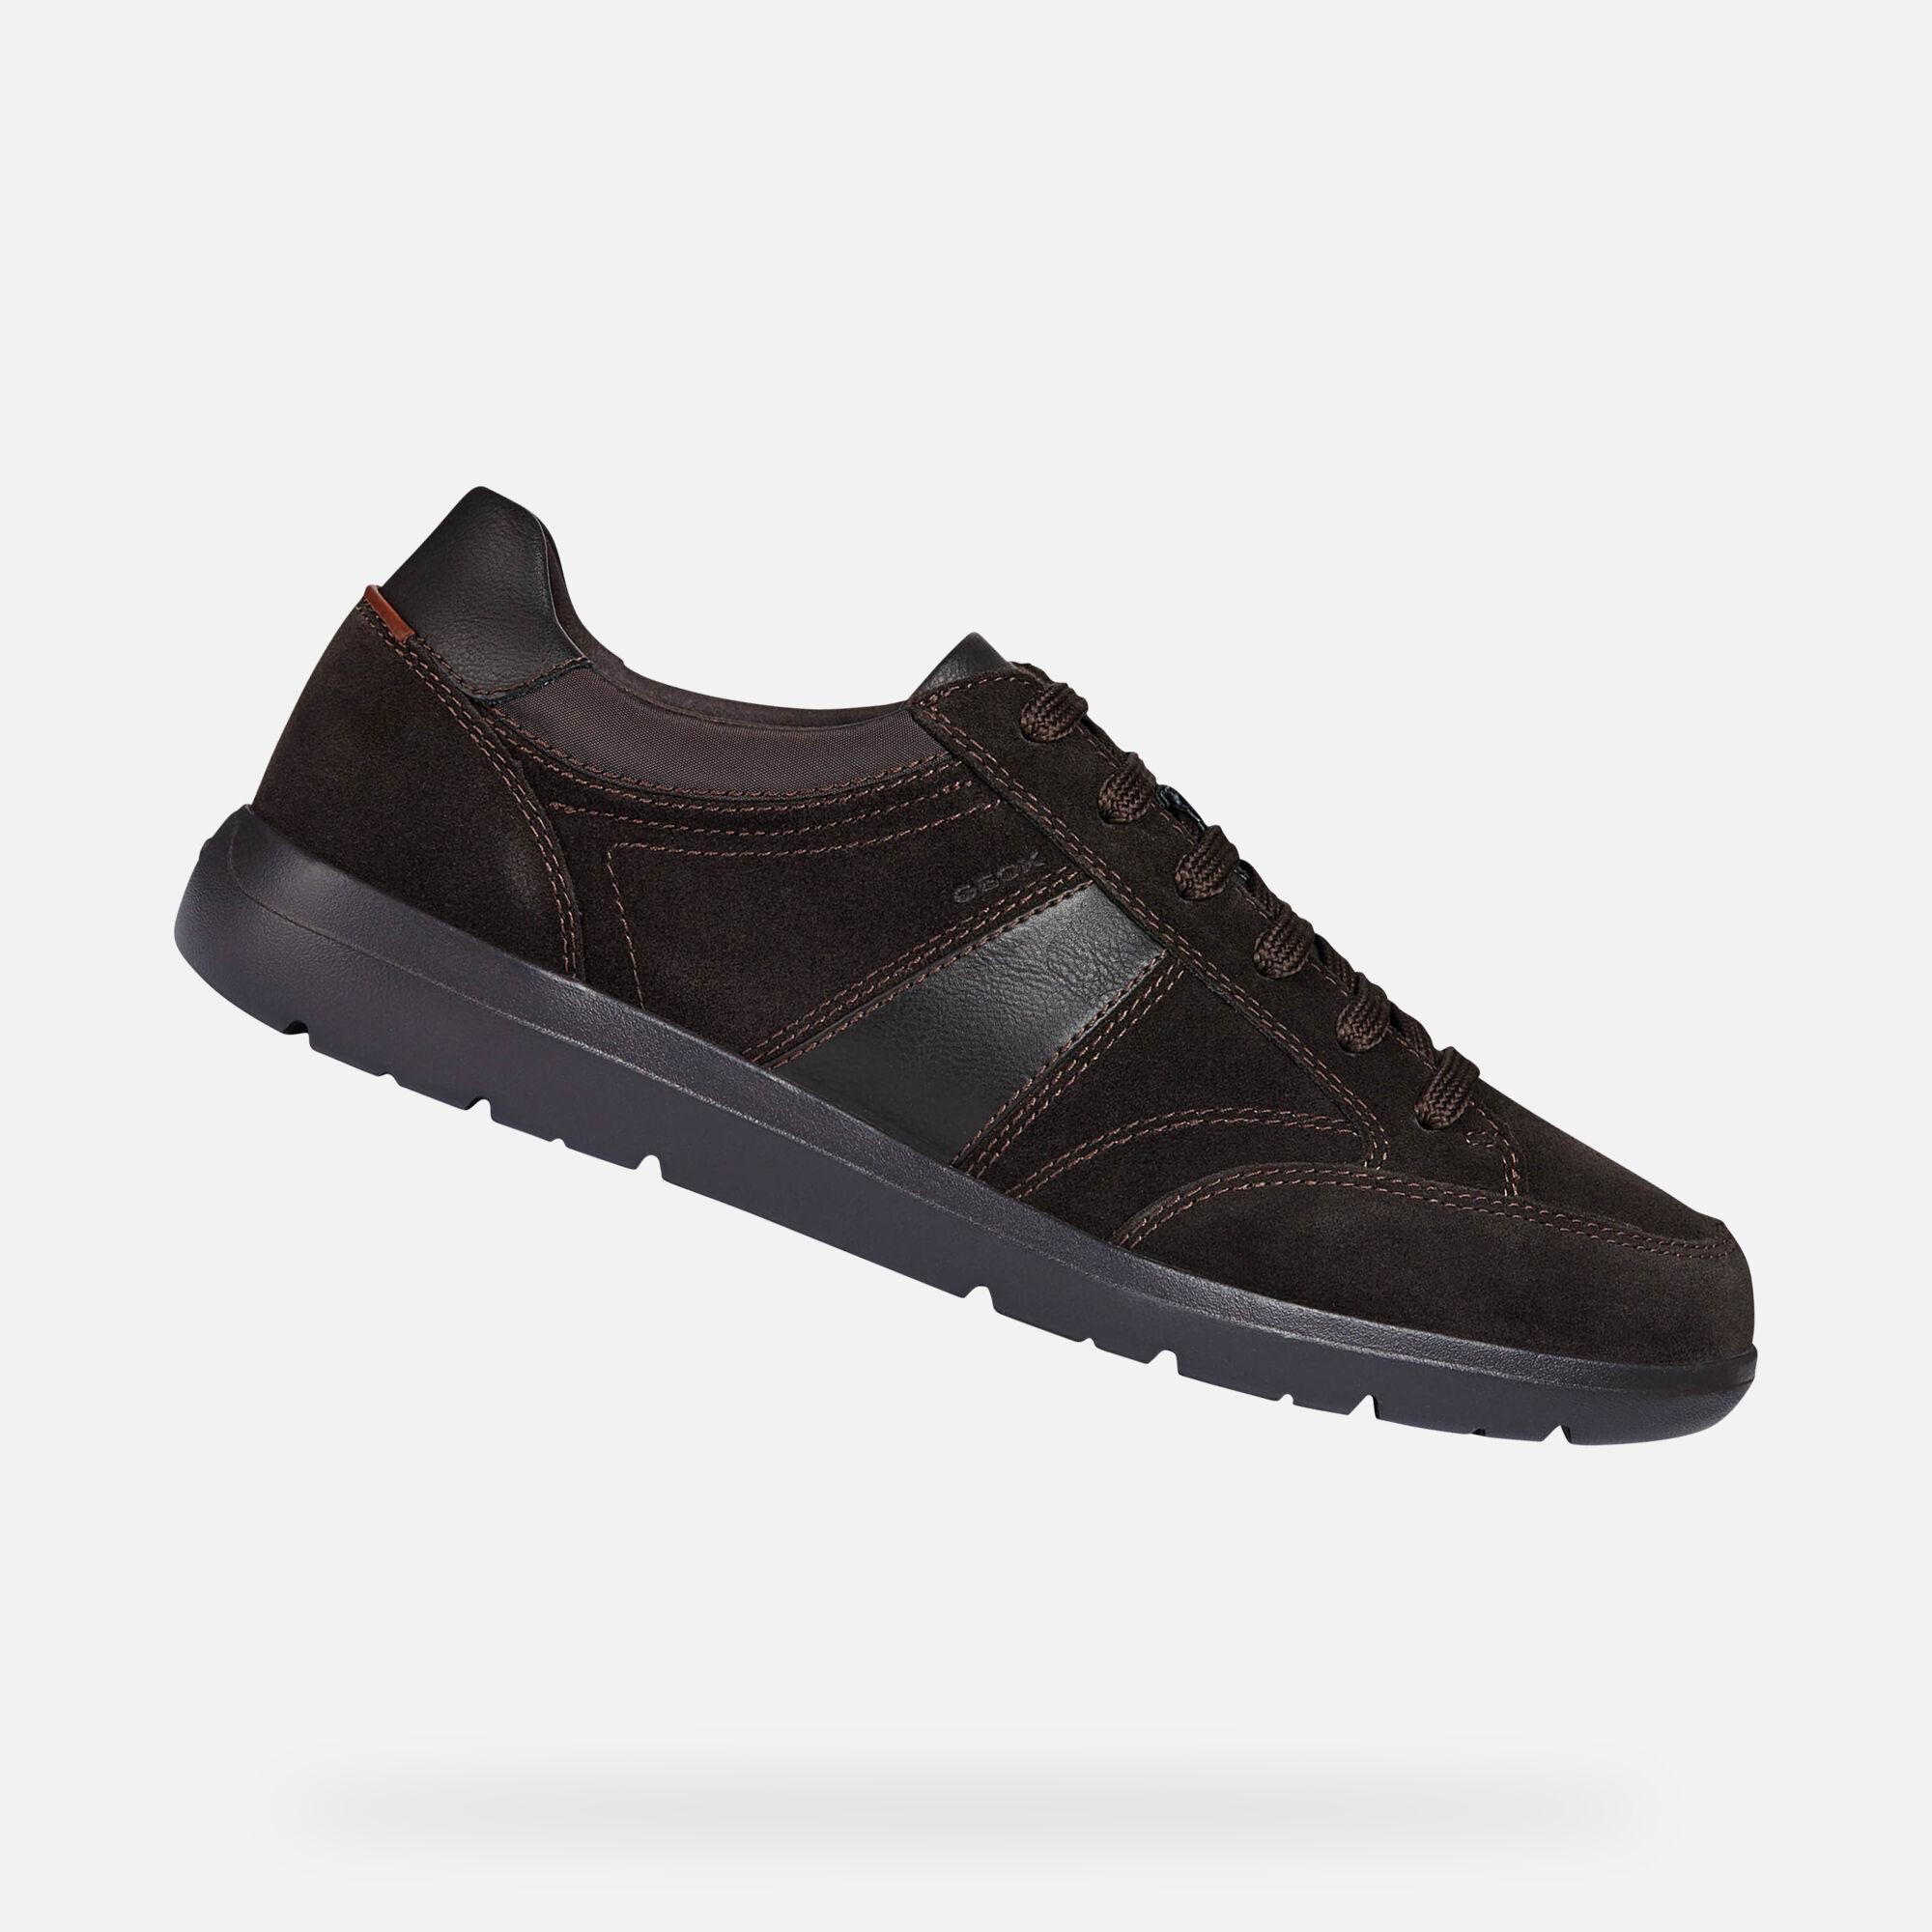 chaussure avec semelle geox homme